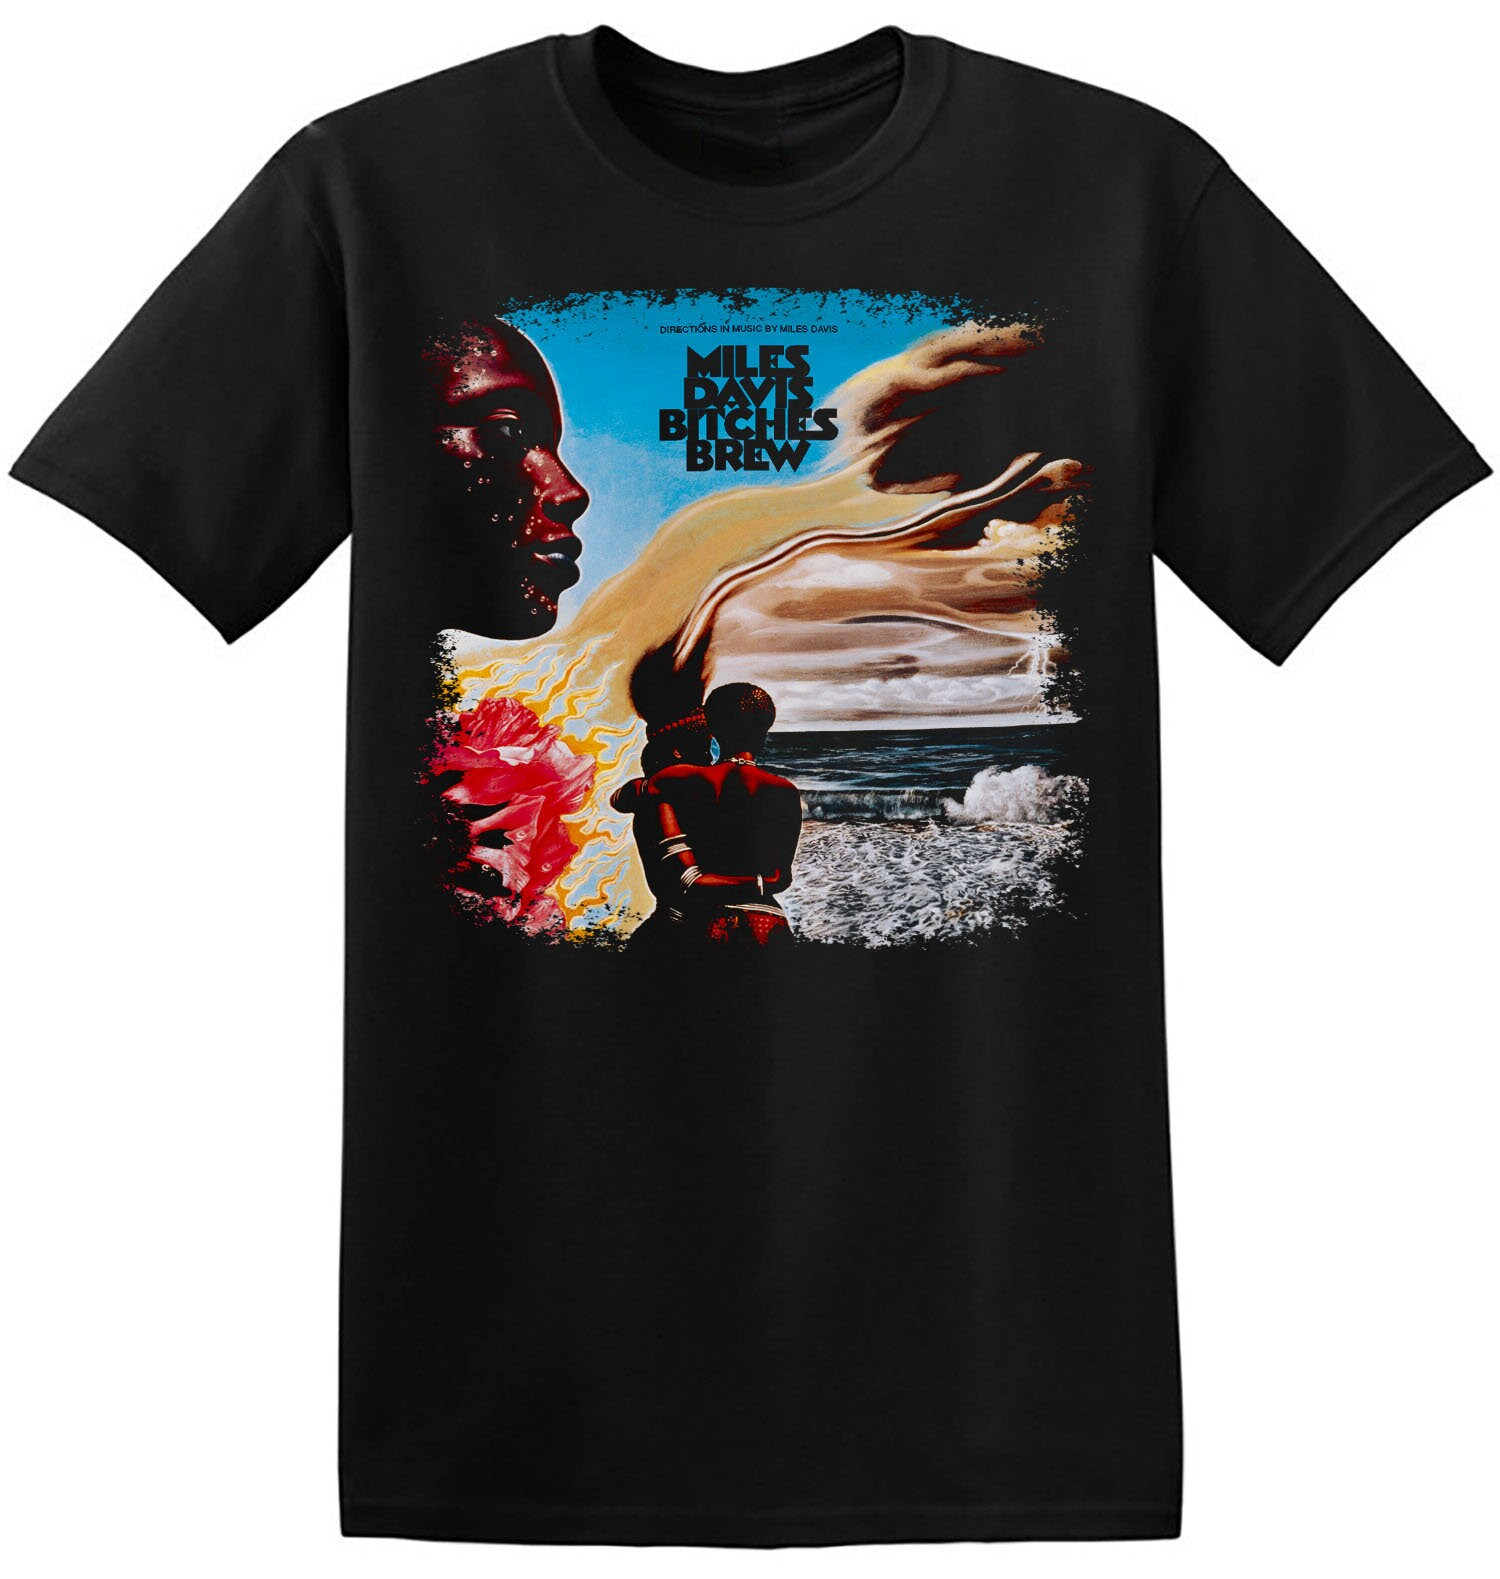 Miles Davis Hand Printed Cotton T Shirt Coltrane Kind of Blue Bitches Brew Jazz